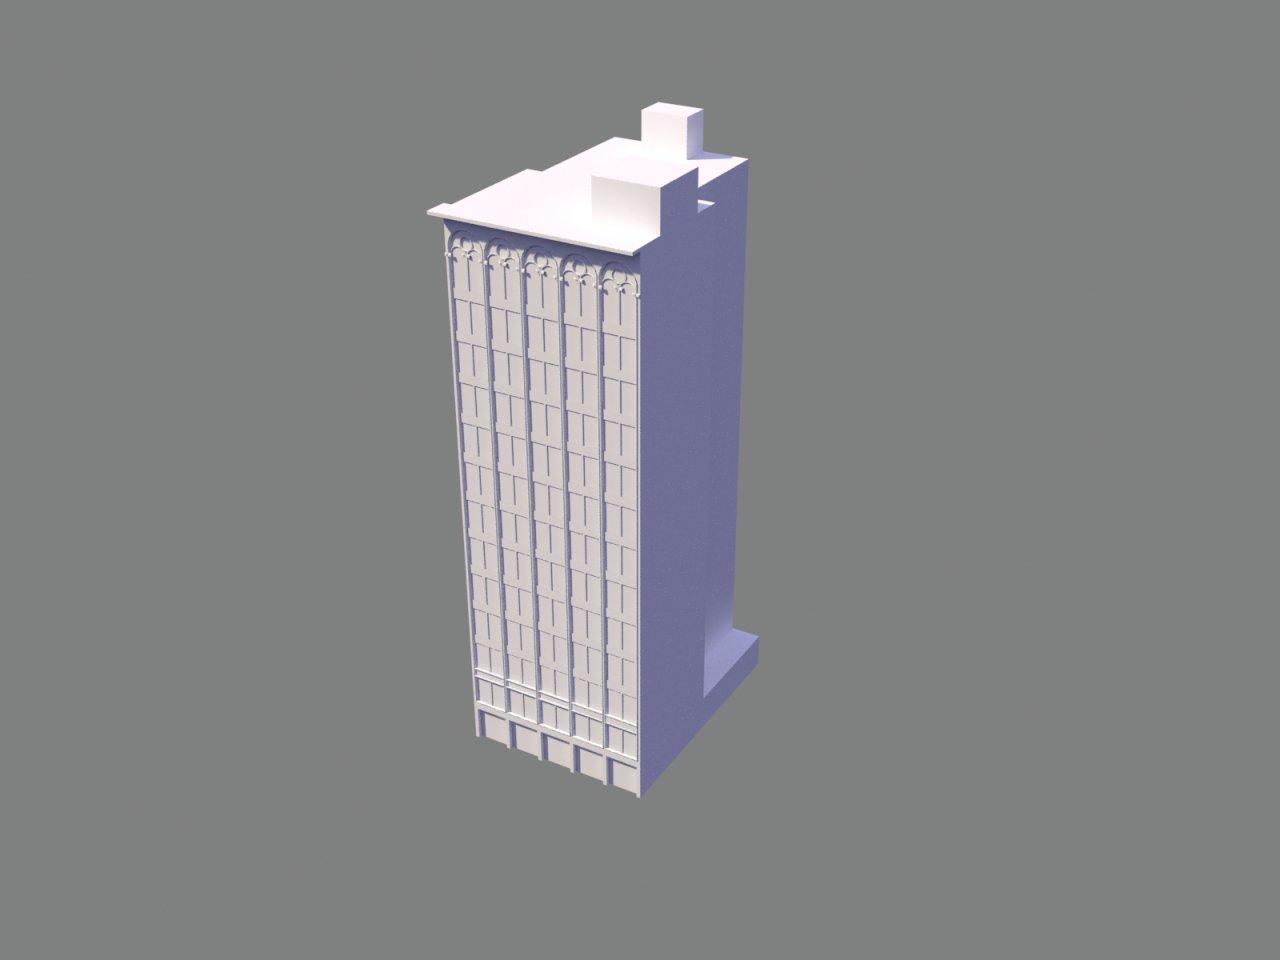 Bayard-Condict_building.thumb.jpg.db7512